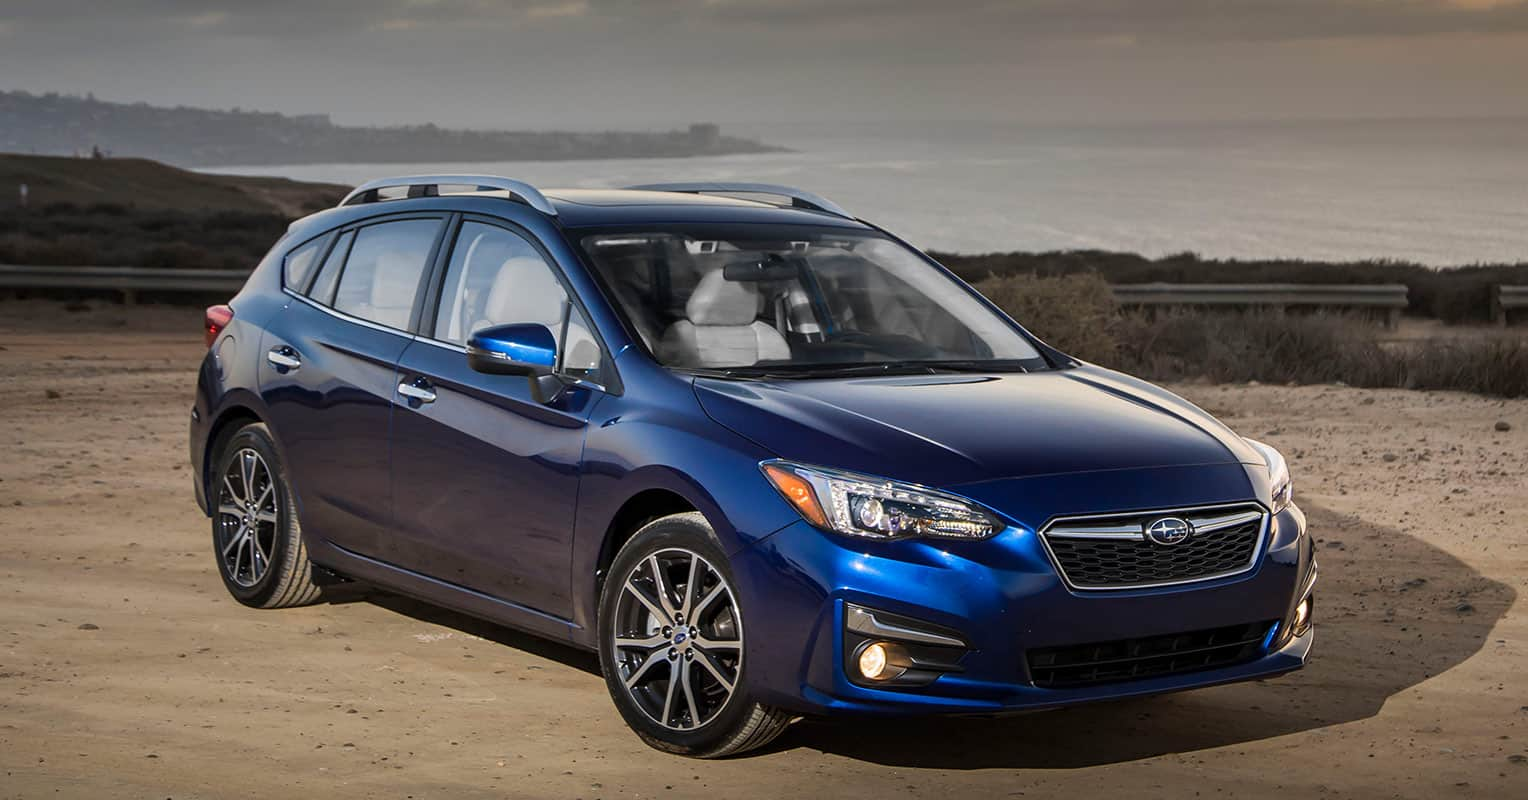 Subaru impreza frontal